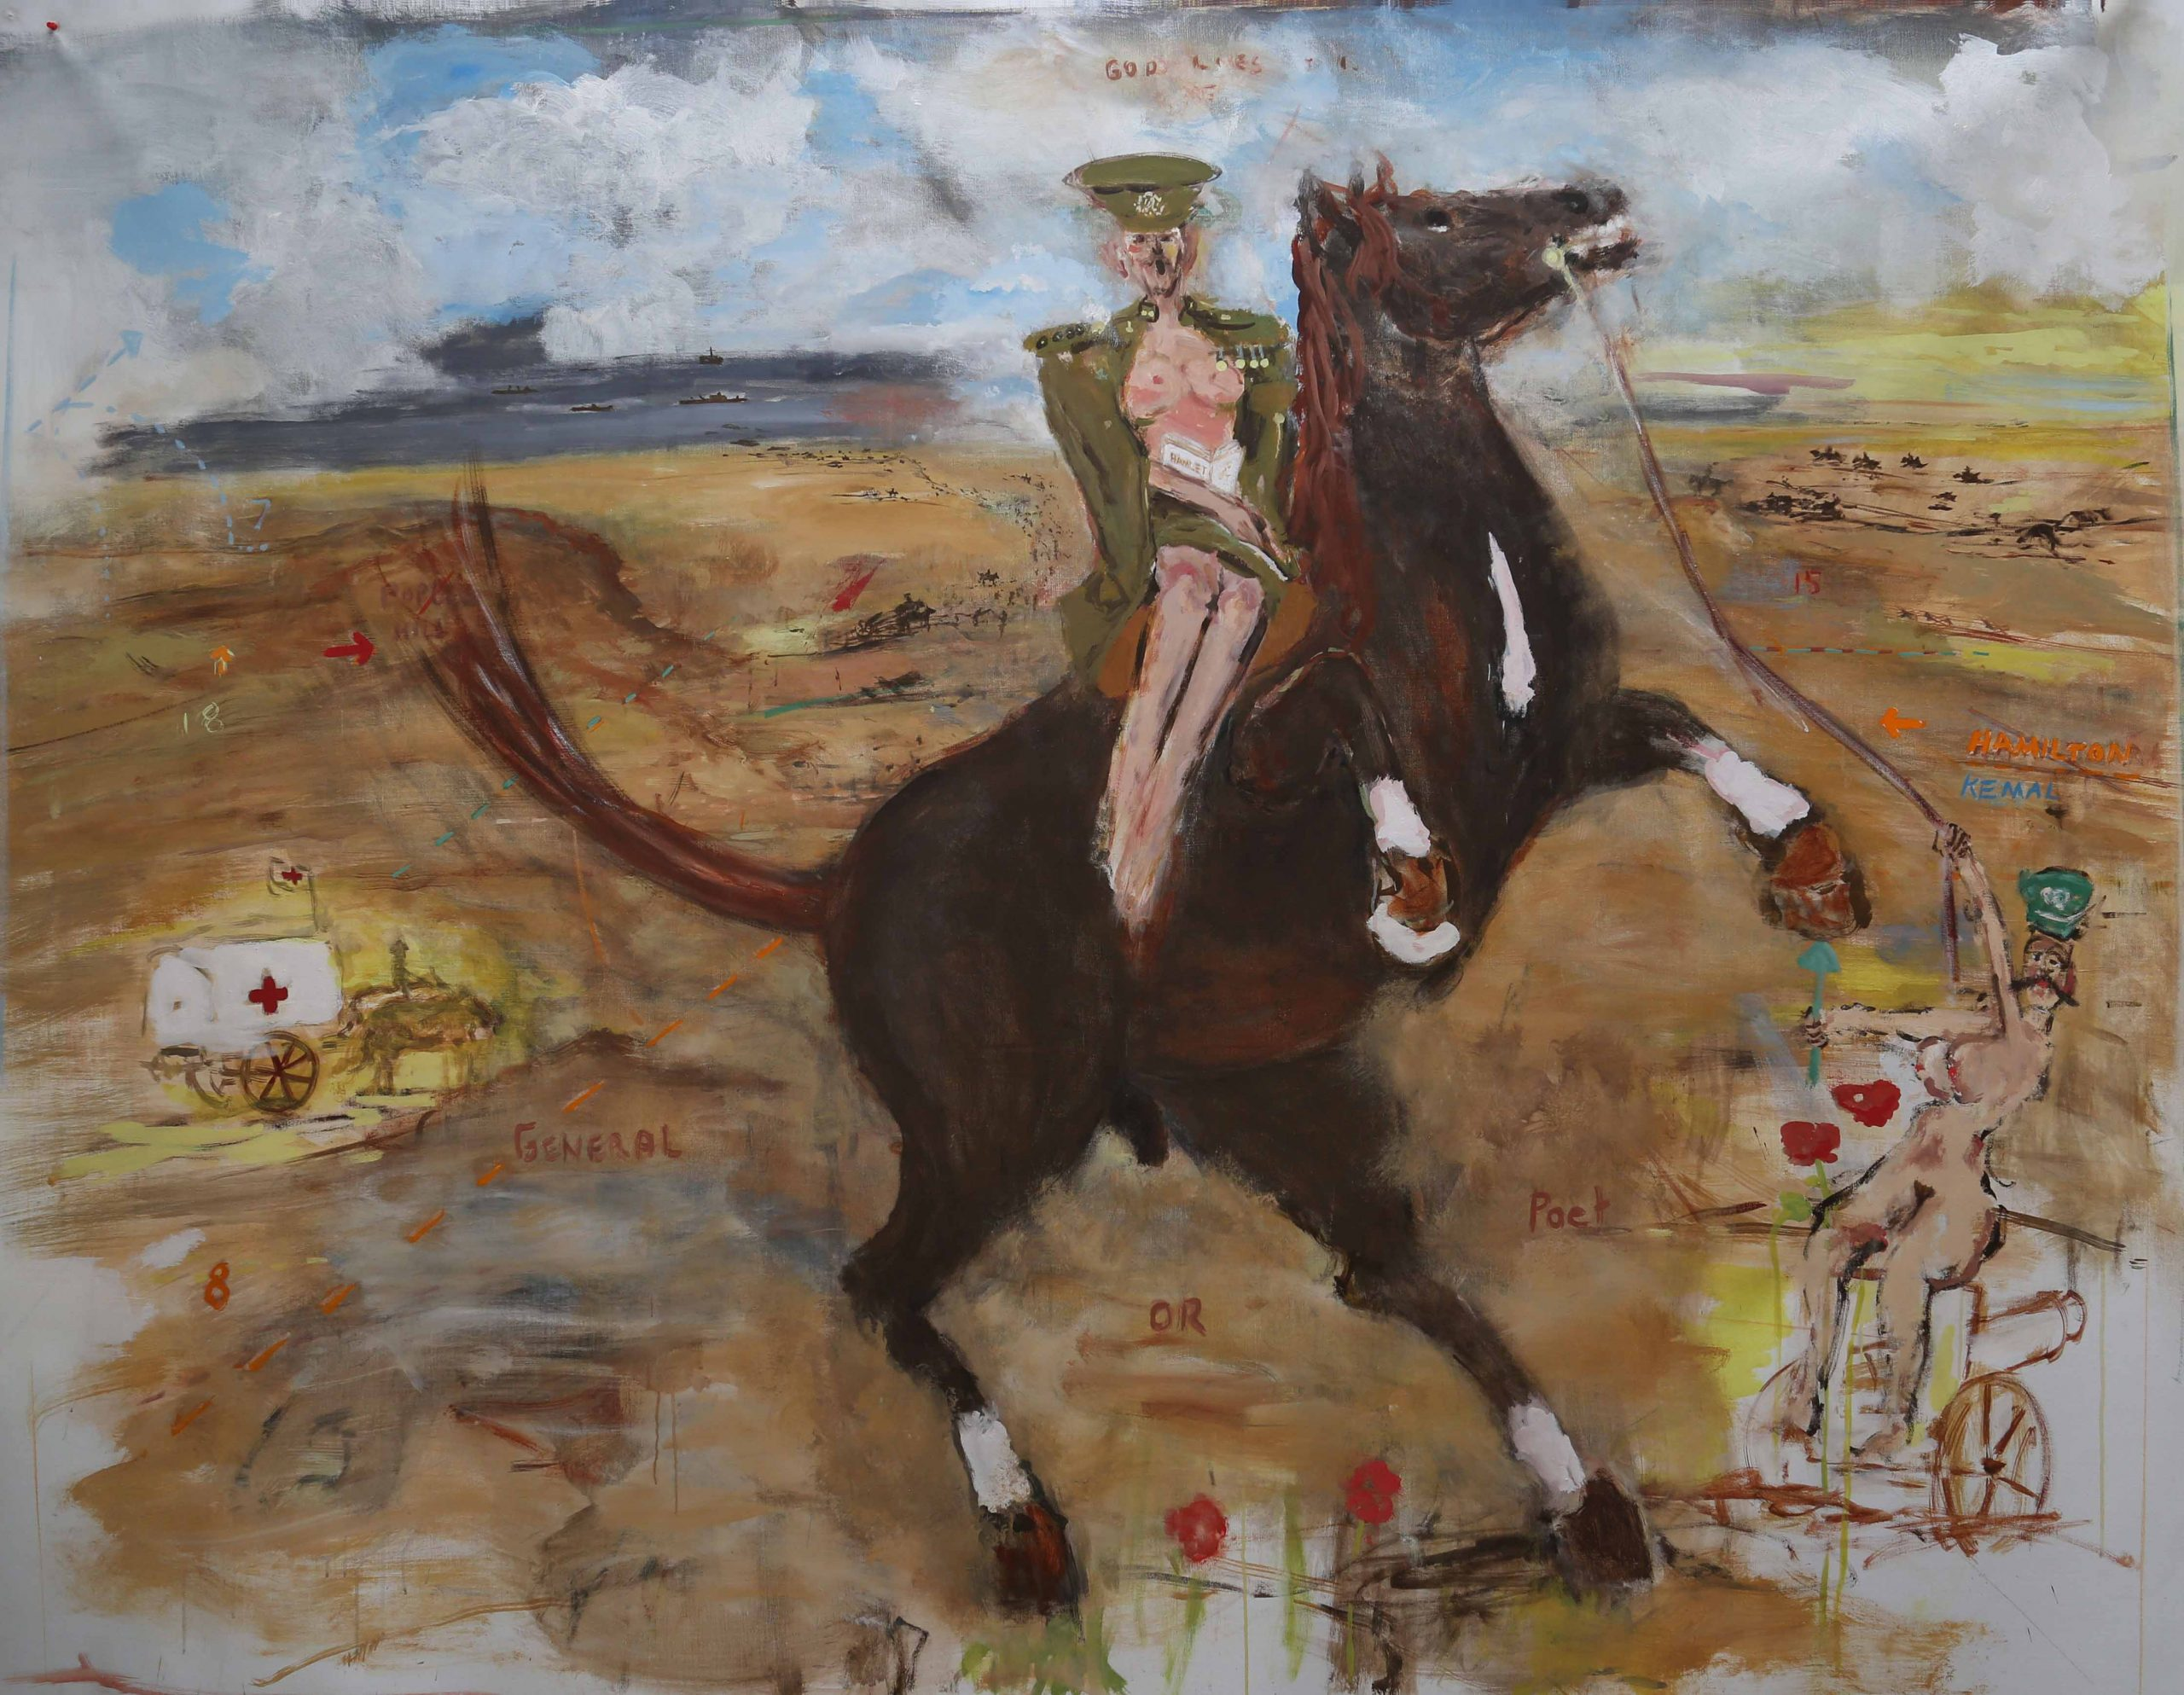 General or poet – Hamilton at Gallipoli